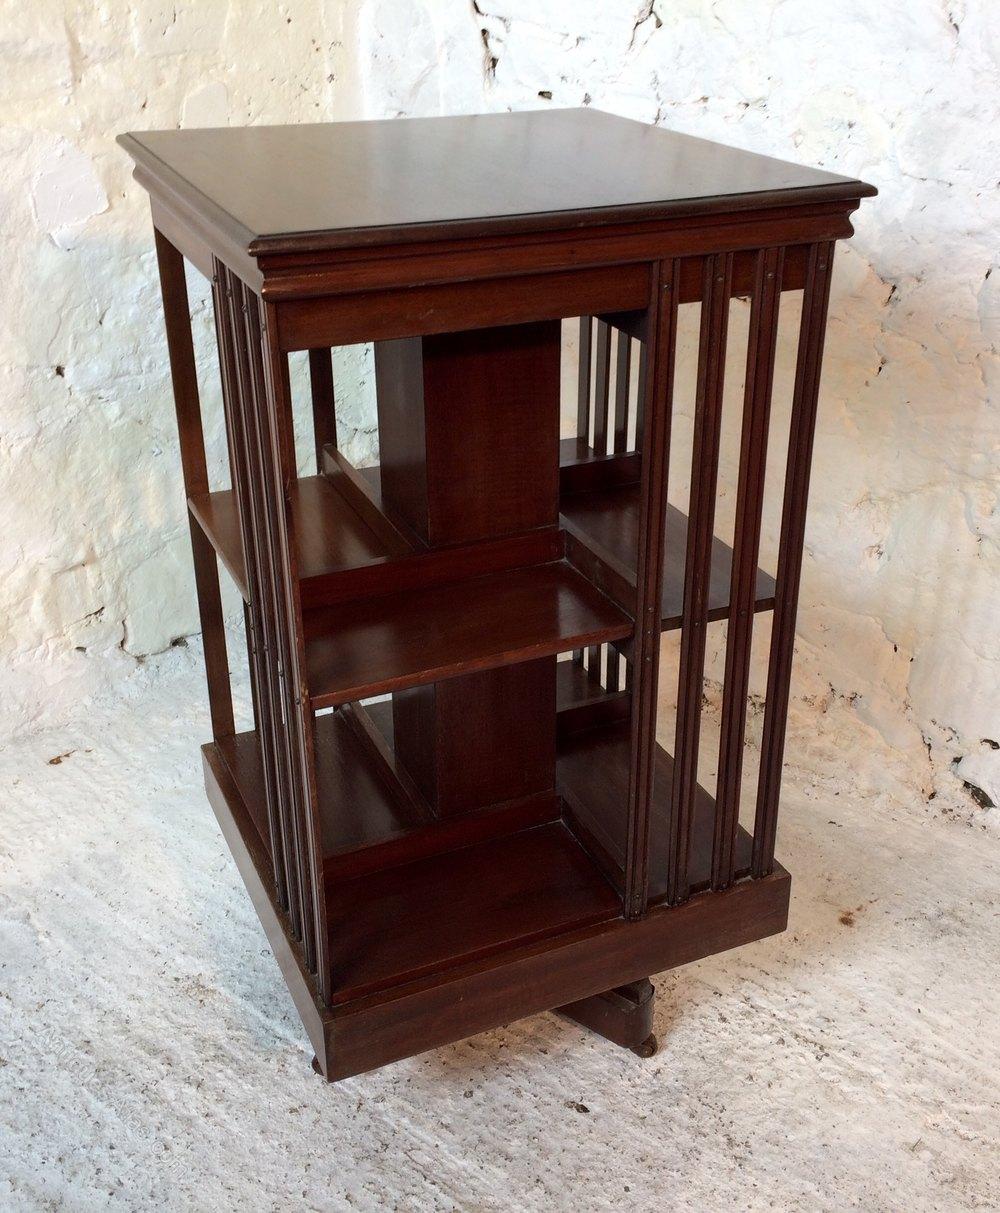 bookcase bookc revolving of image descriptions carousel wood for bookshelf sale